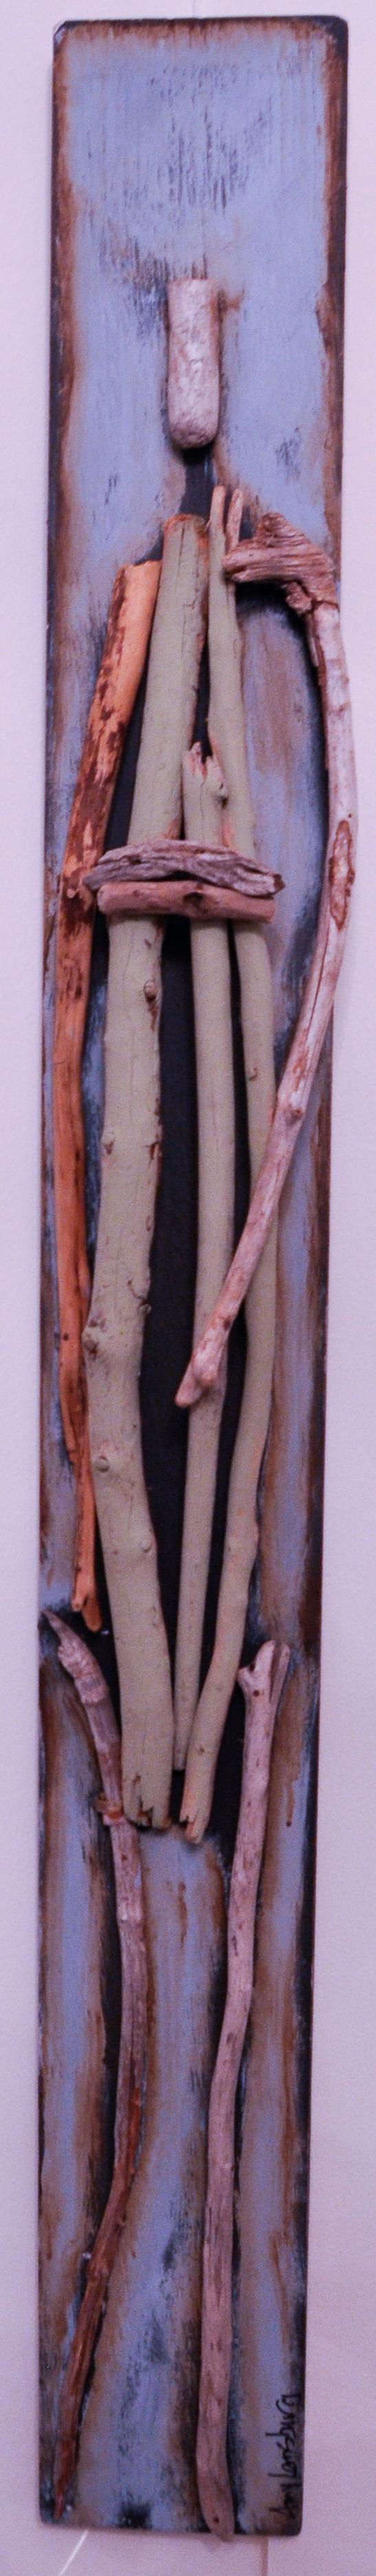 Amy Driftwood 2.jpg